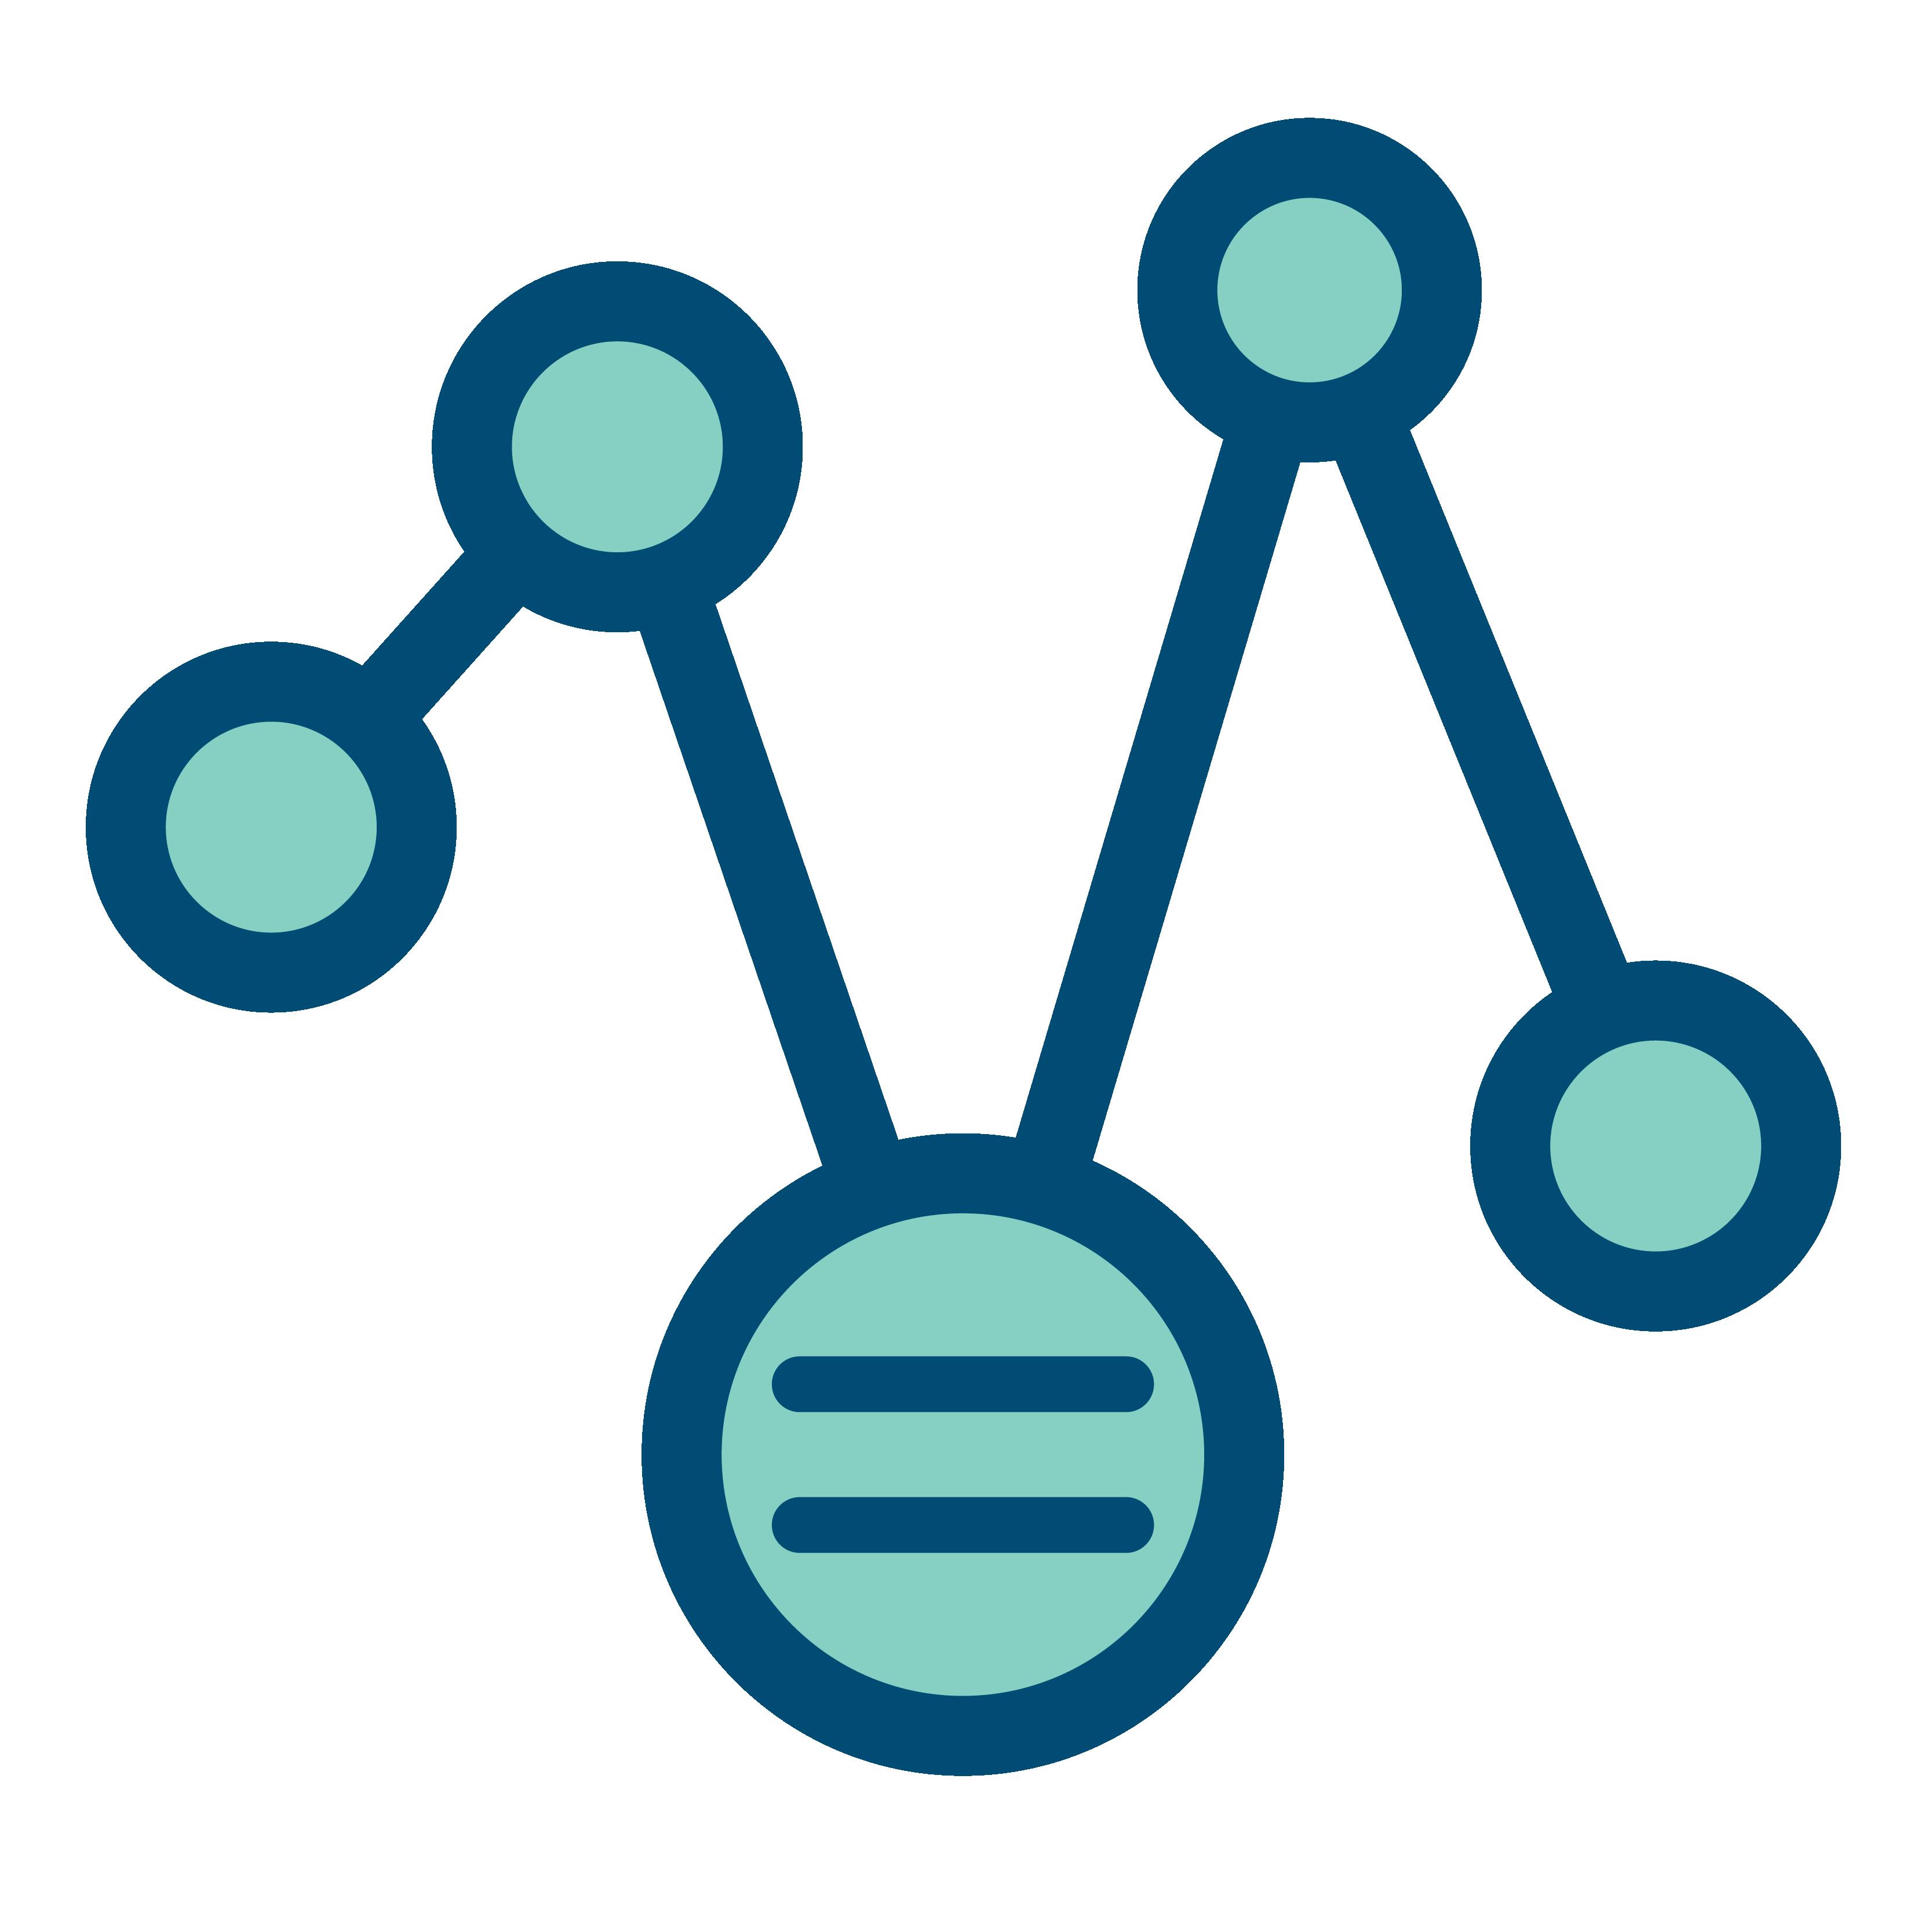 Intel_Inform - Green